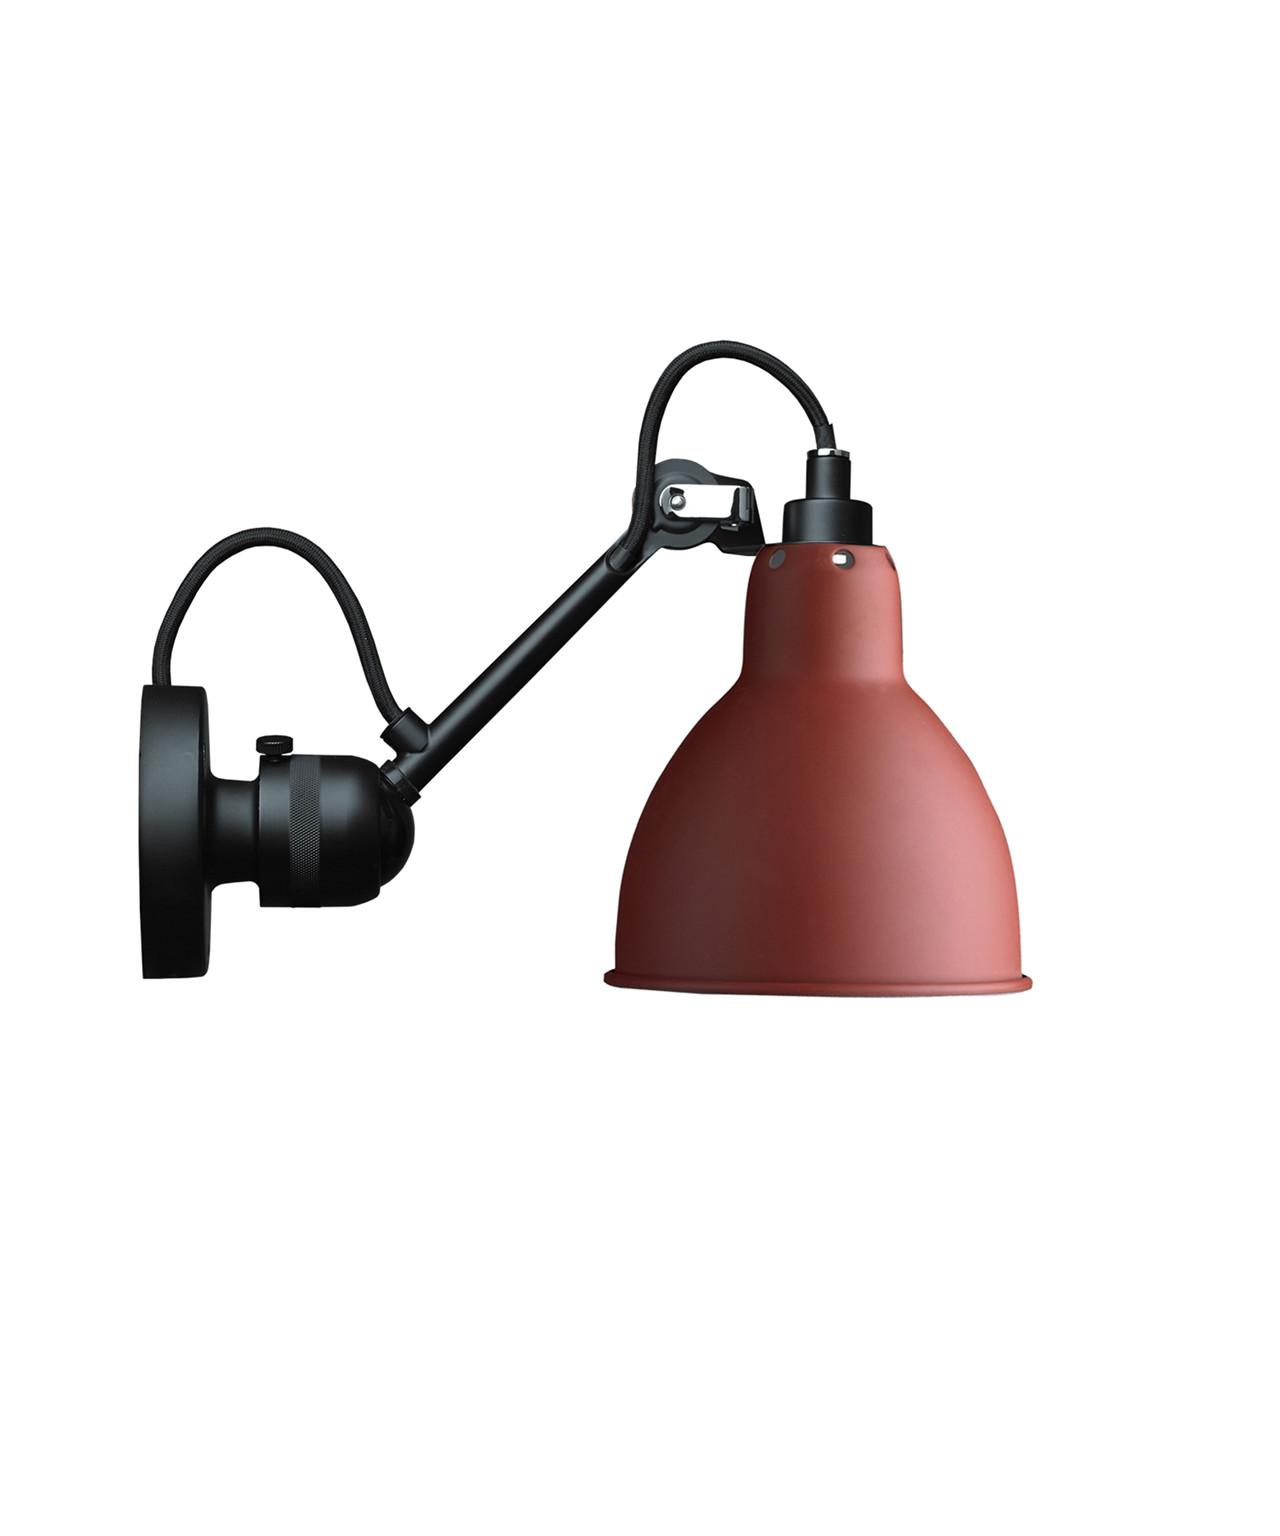 304 wandleuchte rot lampe gras. Black Bedroom Furniture Sets. Home Design Ideas